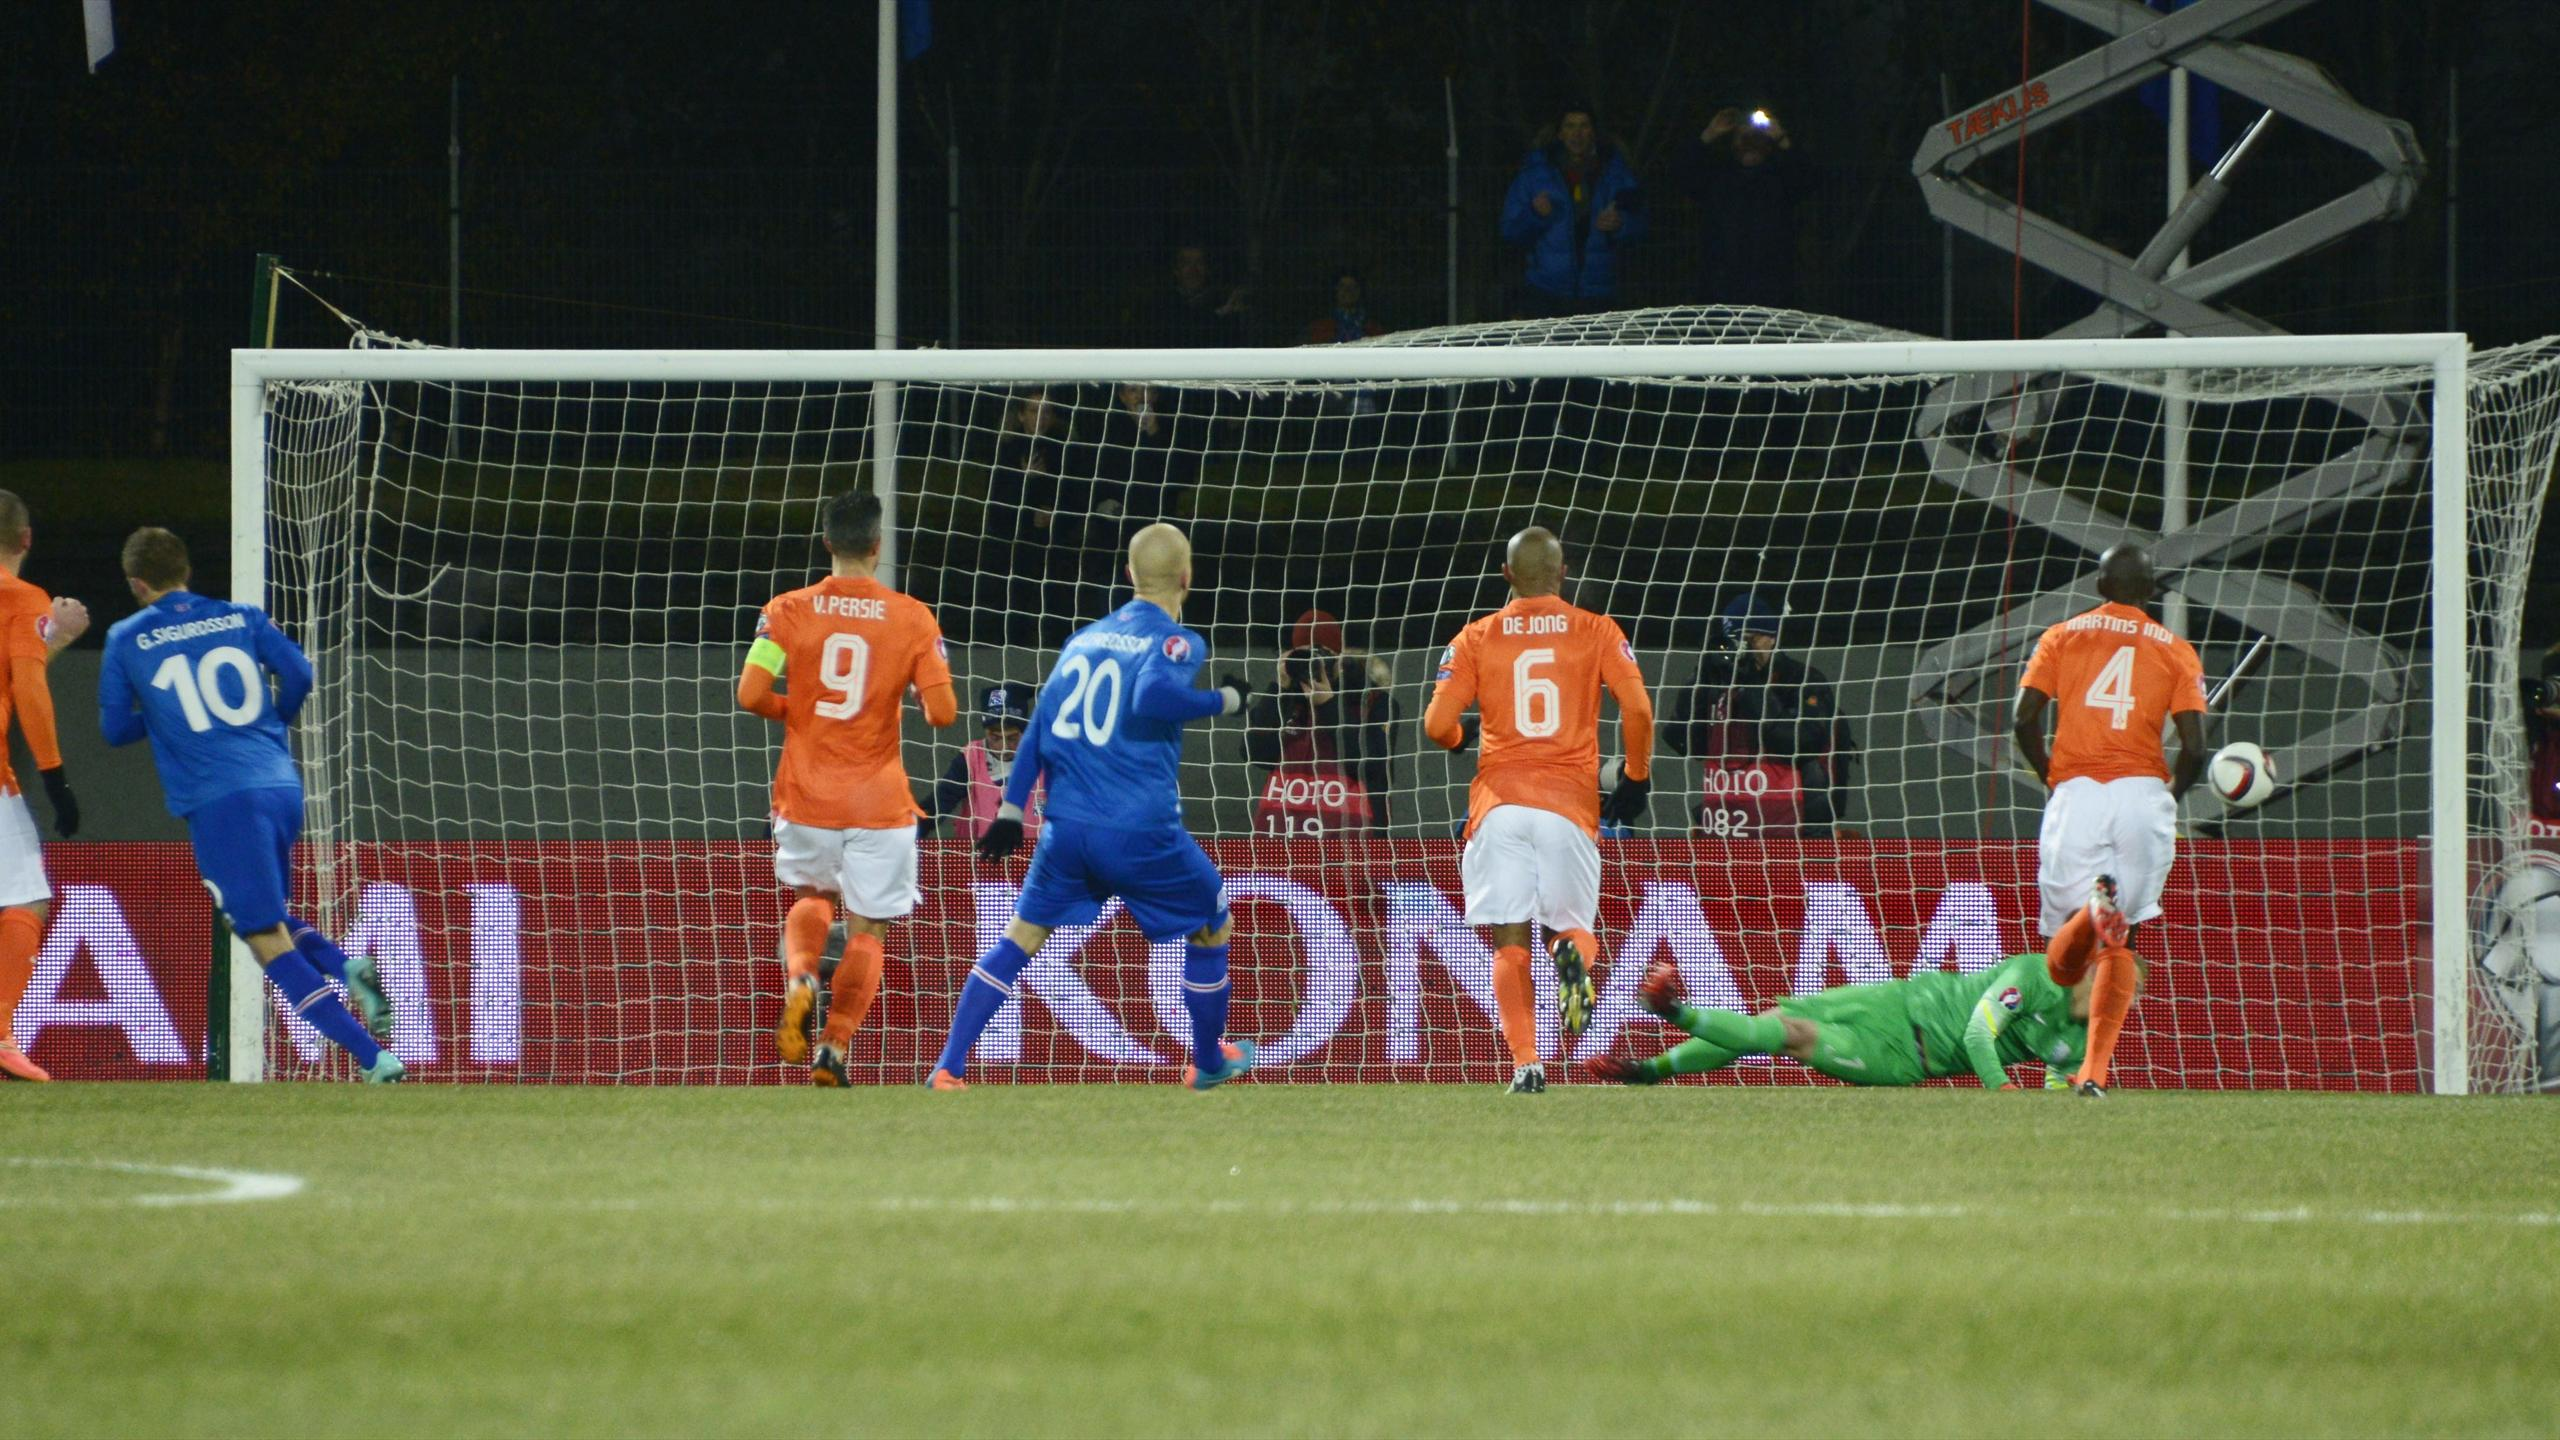 Sigurdsson stars as Iceland shock Netherlands - Eurosport